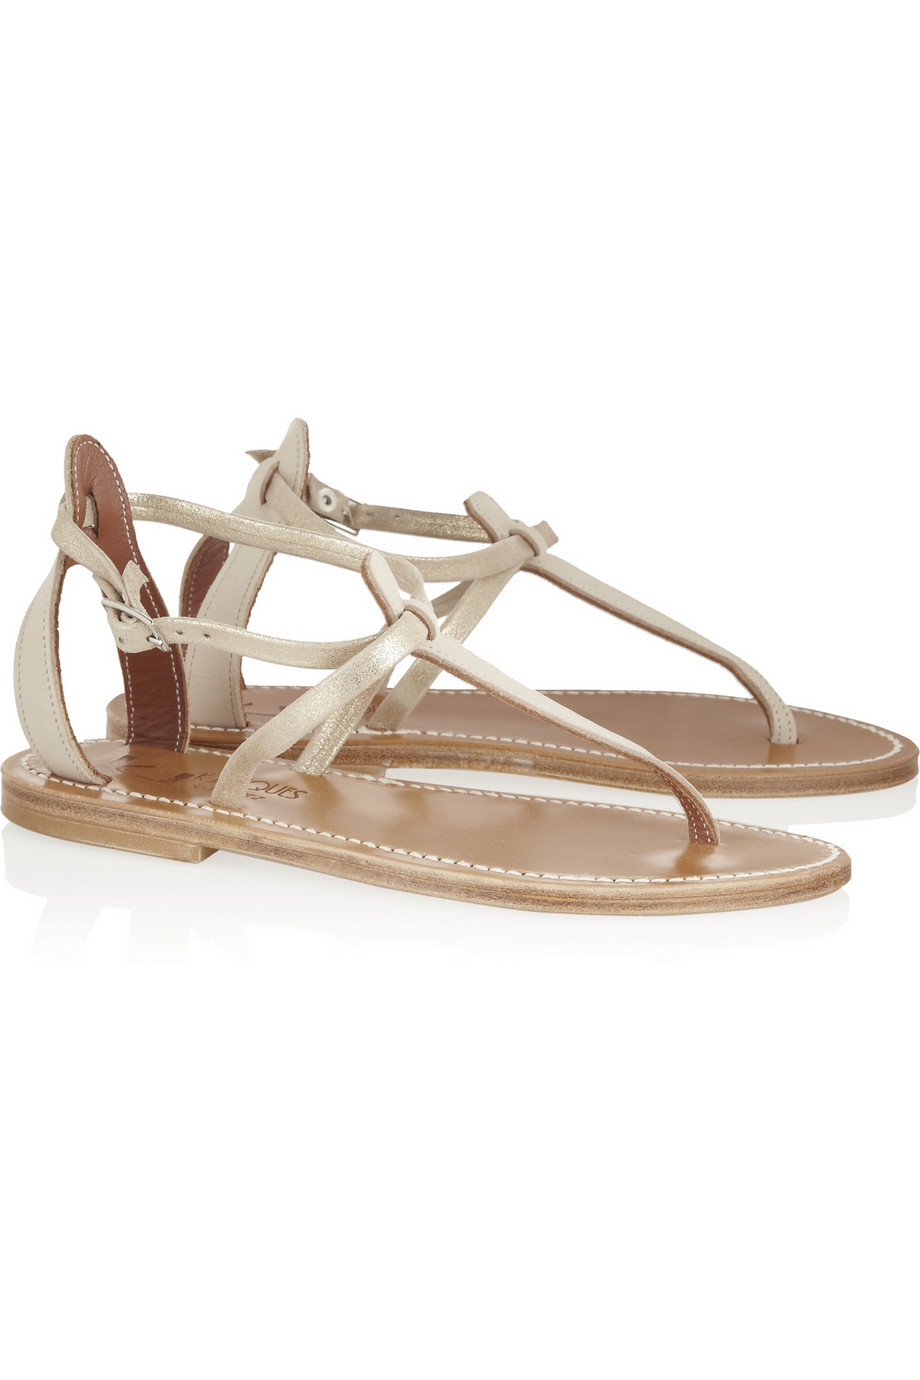 Discount New Arrival K jacques Buffon Leather Sandals Discount Lowest Price IXmRGYz